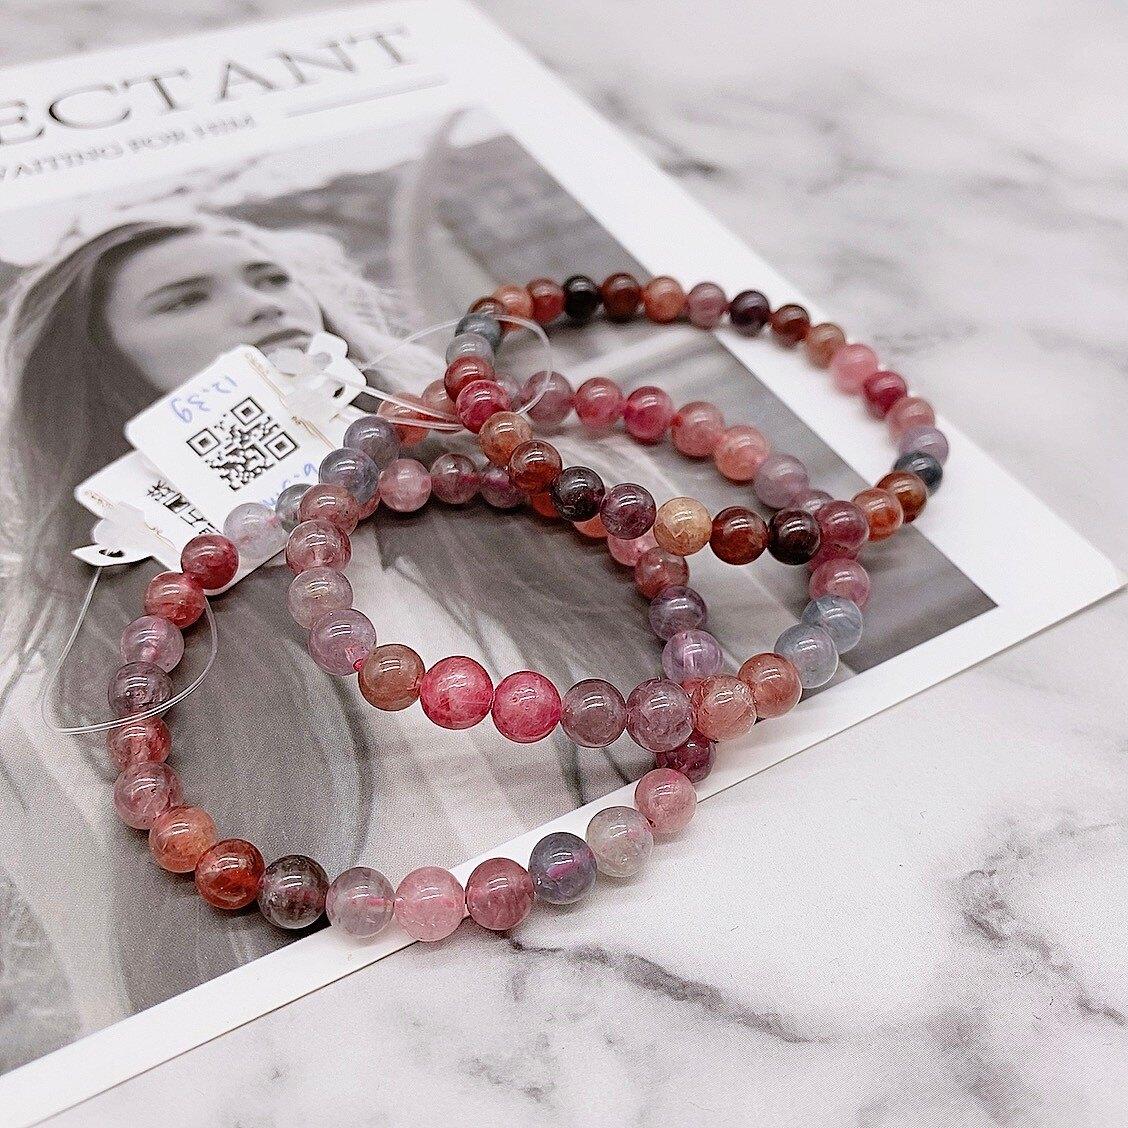 Tai Fu◆ 尖晶石圓珠|水晶|紅寶石|多色尖晶石|恢復活力|積極|助成功|天然水晶